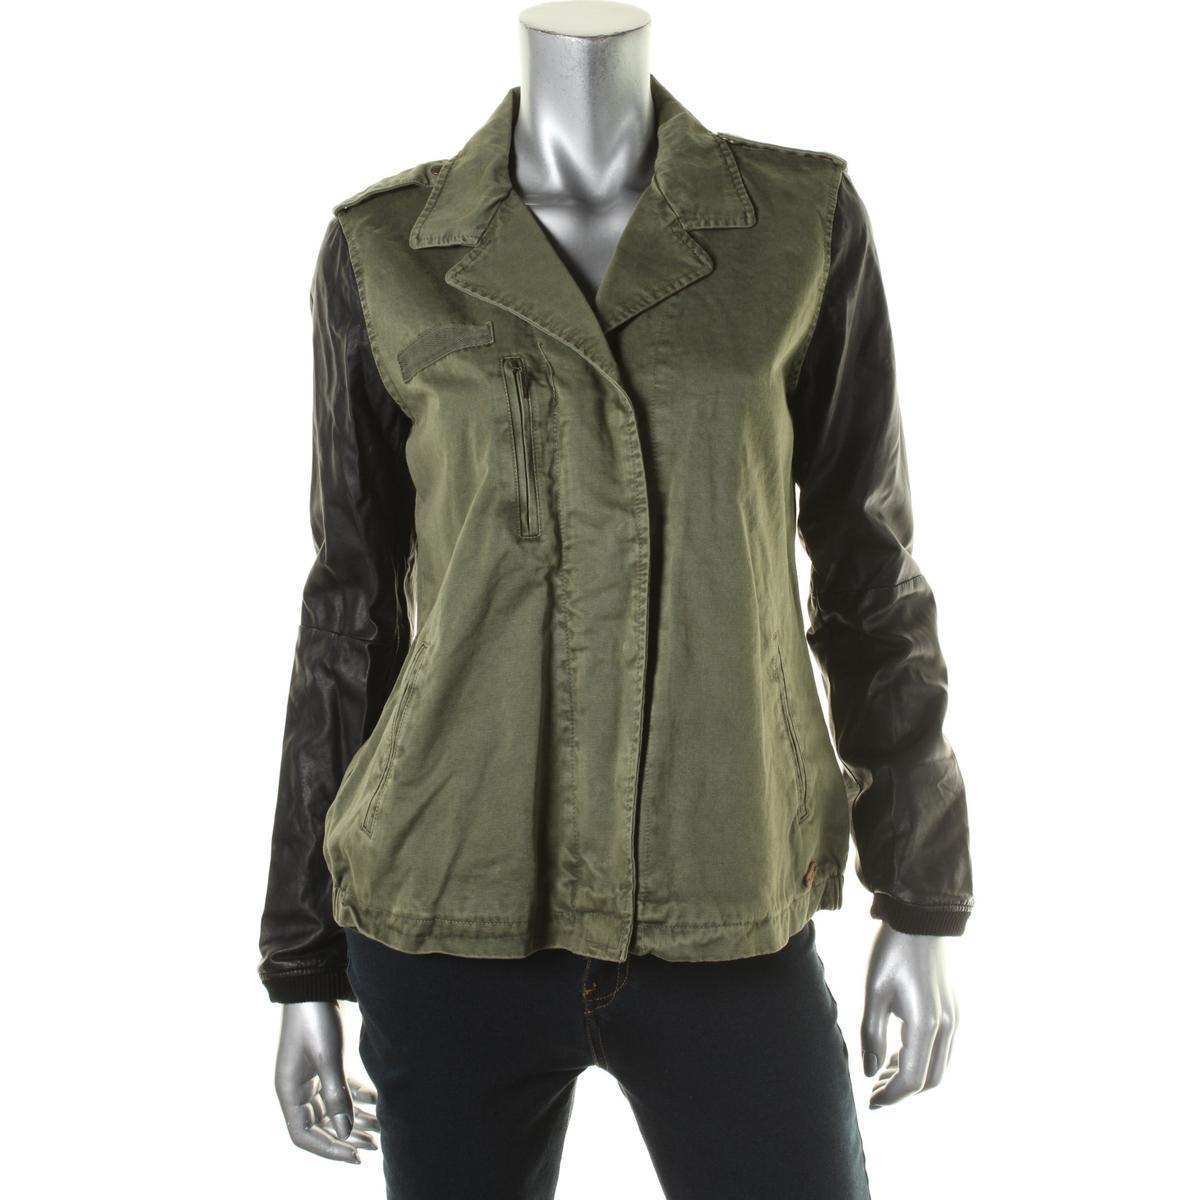 Zara Trafaluc 8134 Womens Green Faux Trim Outerwear Jacket Coat L BHFO | eBay